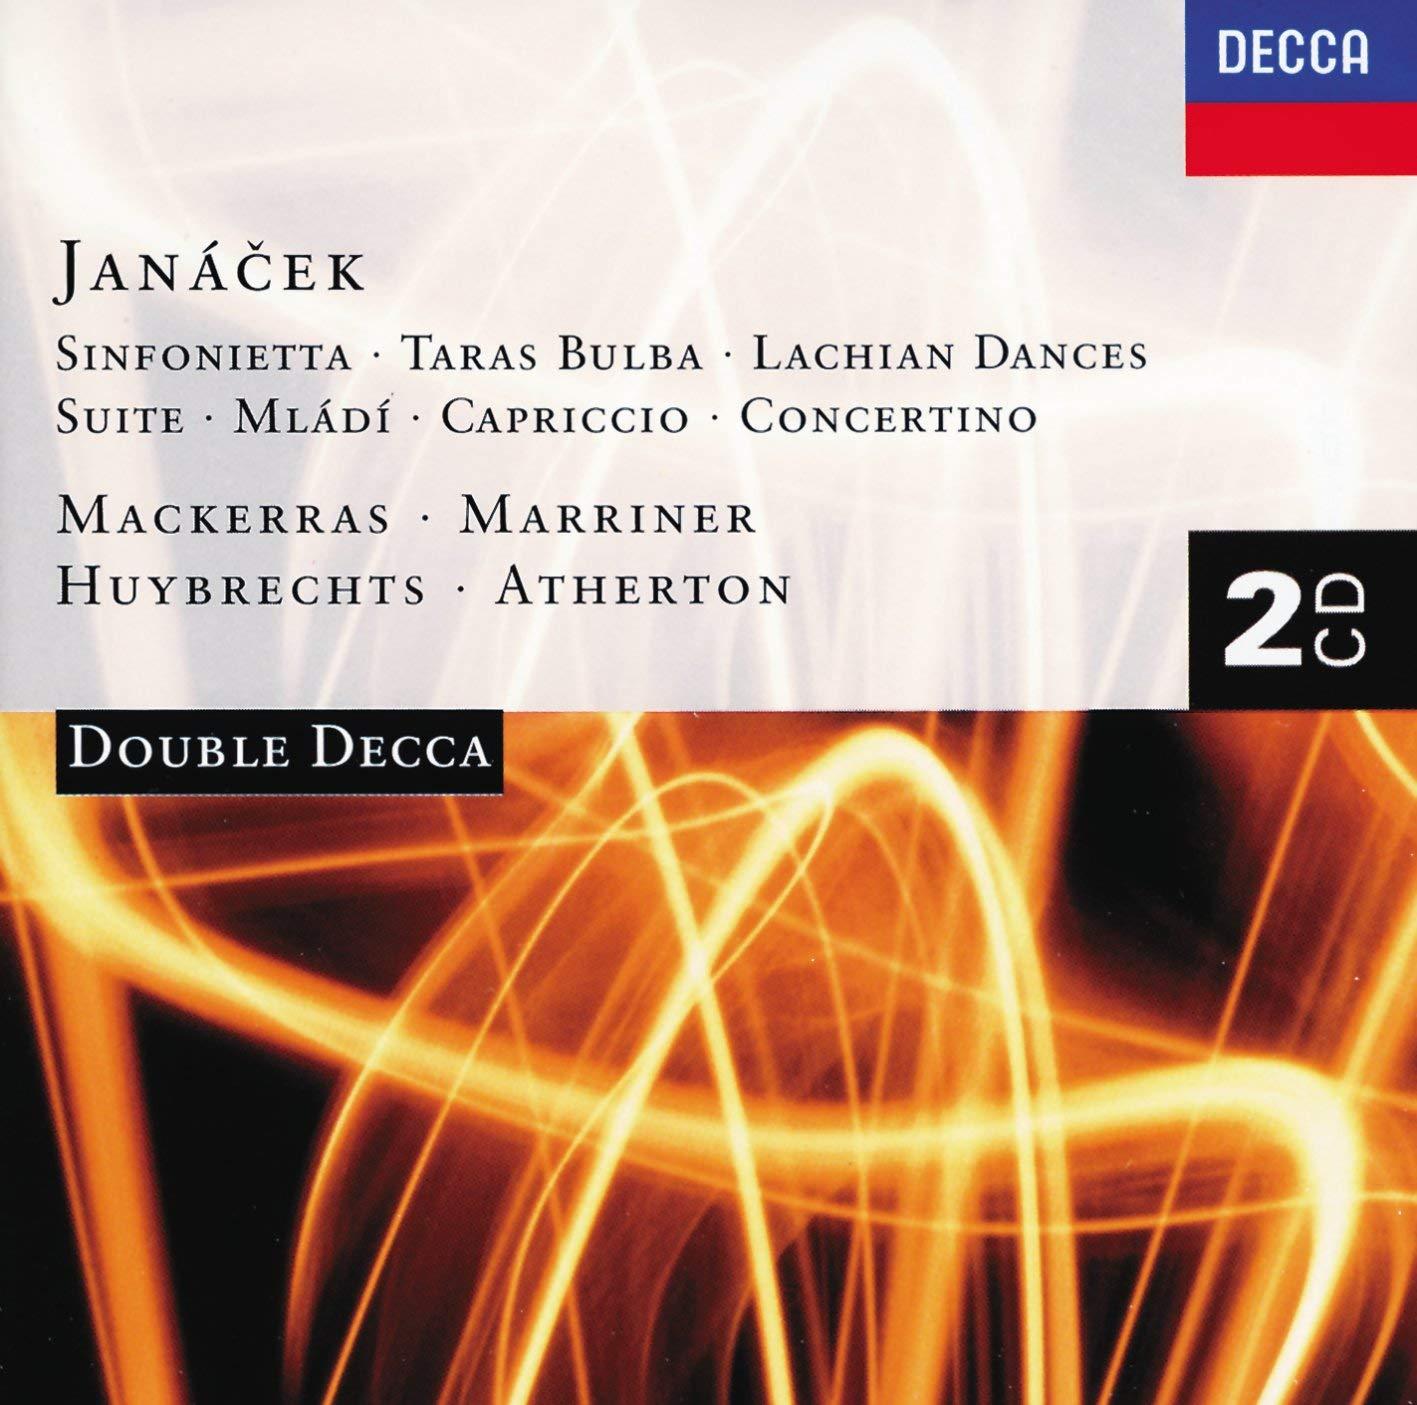 Janácek: Sinfonietta / Taras Bulba / Lachian Dances / Suite / Mládi / Capriccio / Concertino by Decca